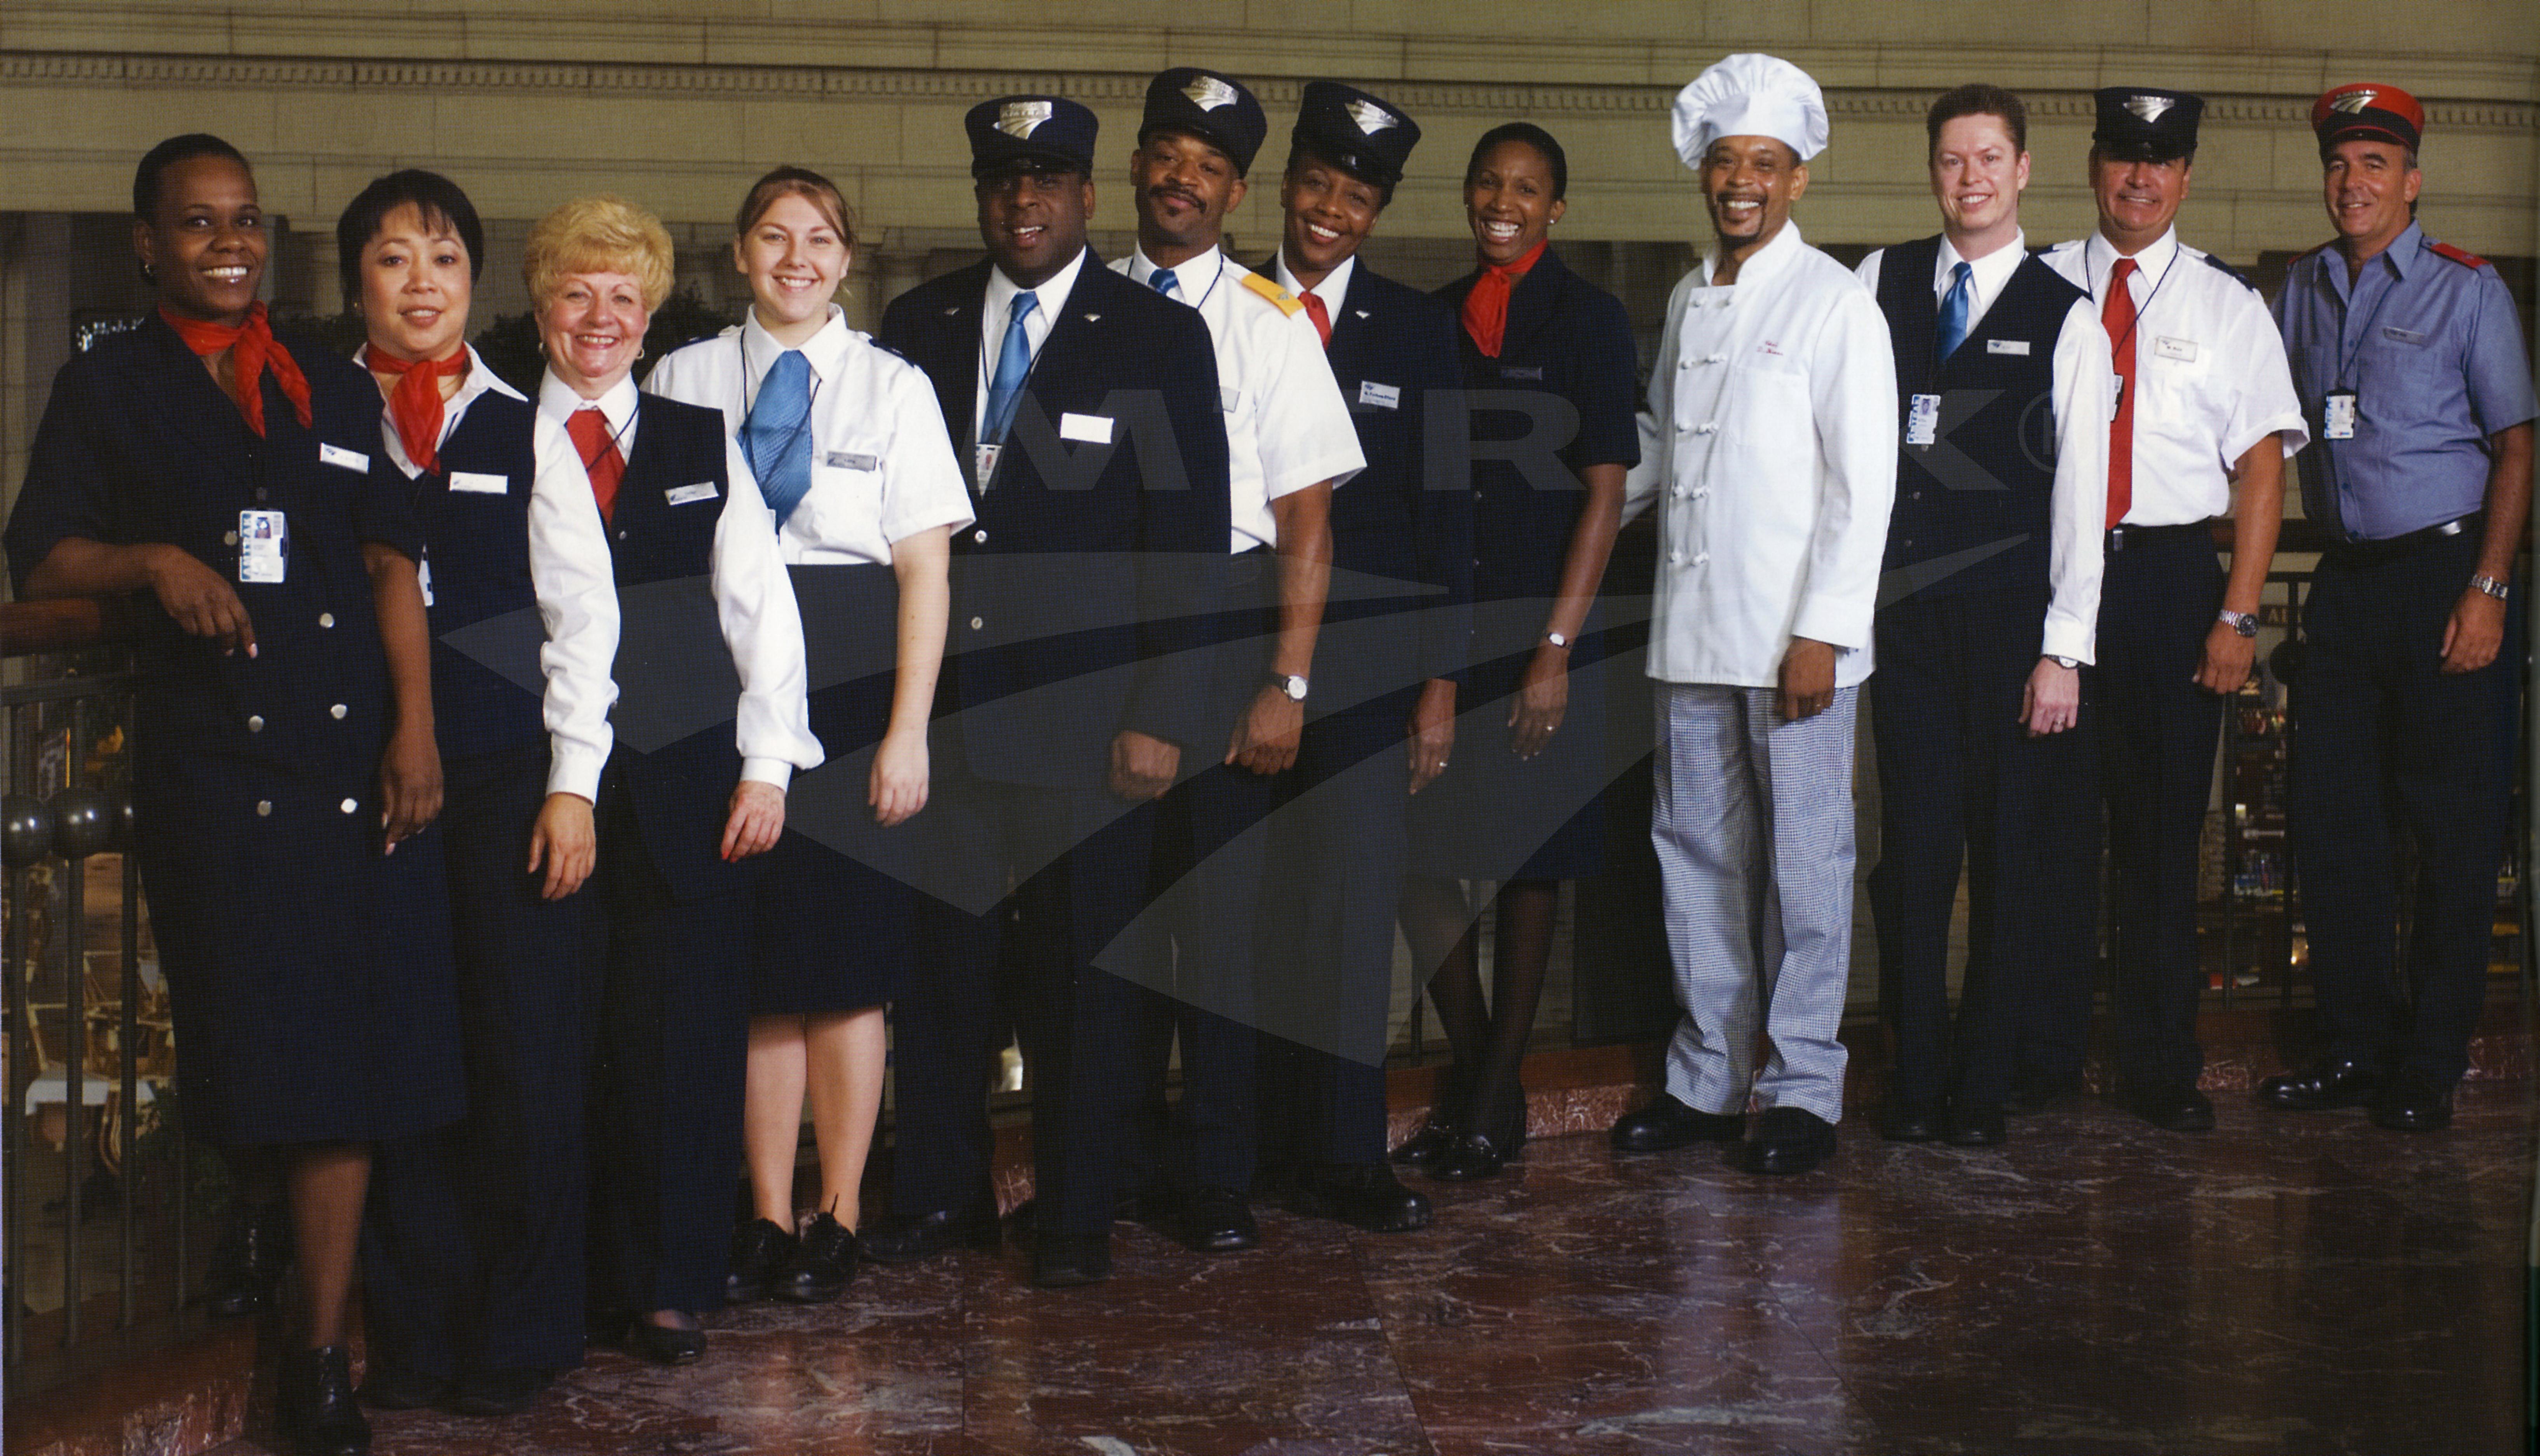 Uniform Employee 55